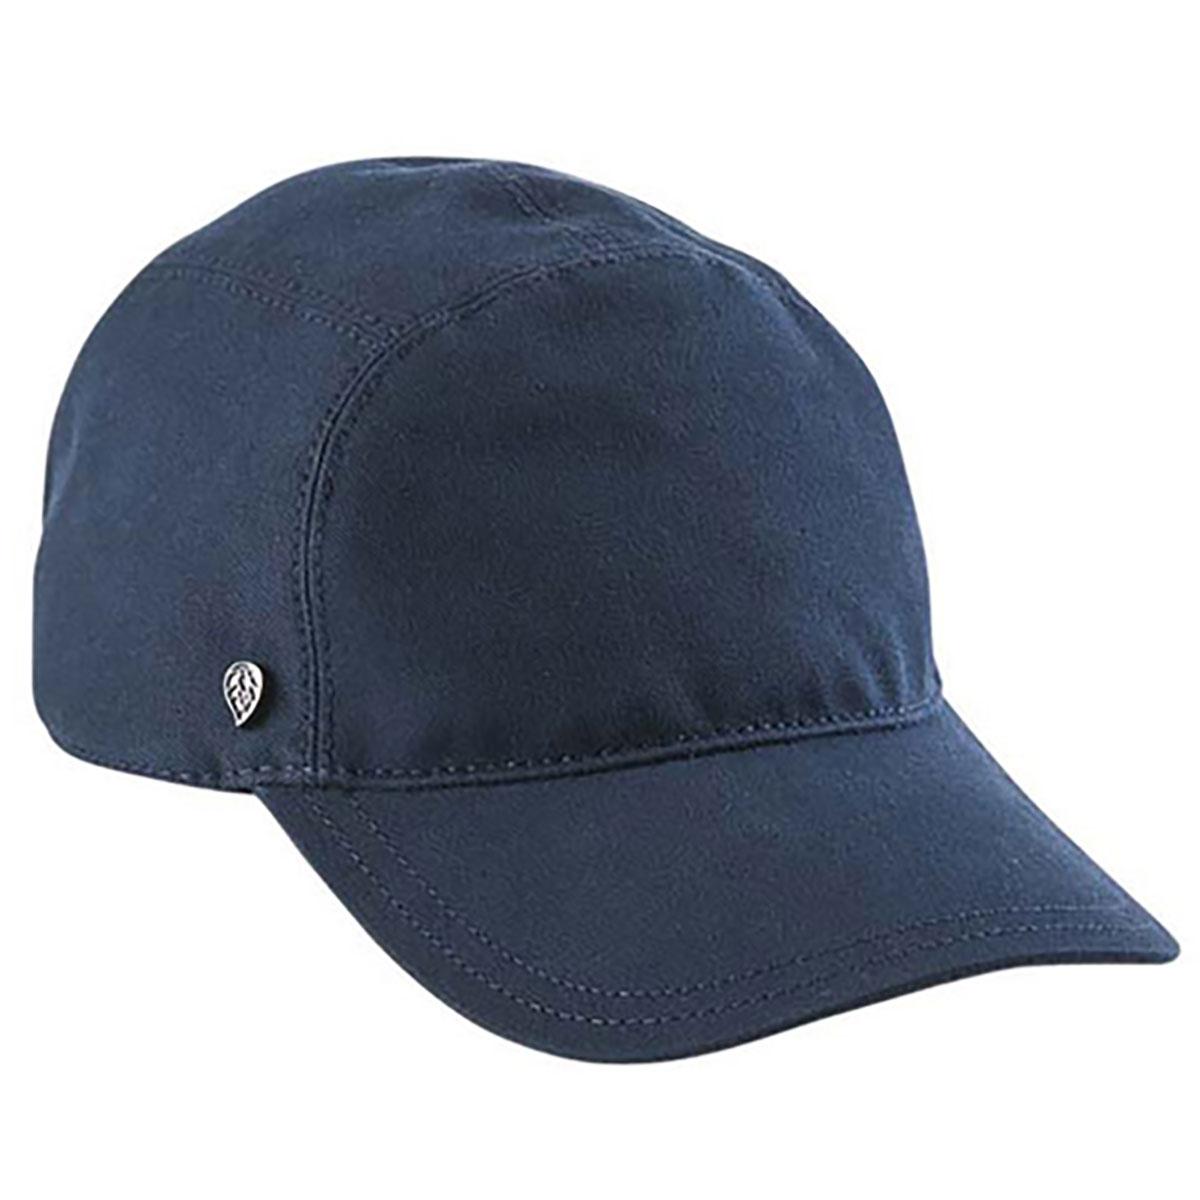 Kaminski Cleveland Cap in Indigo,Black